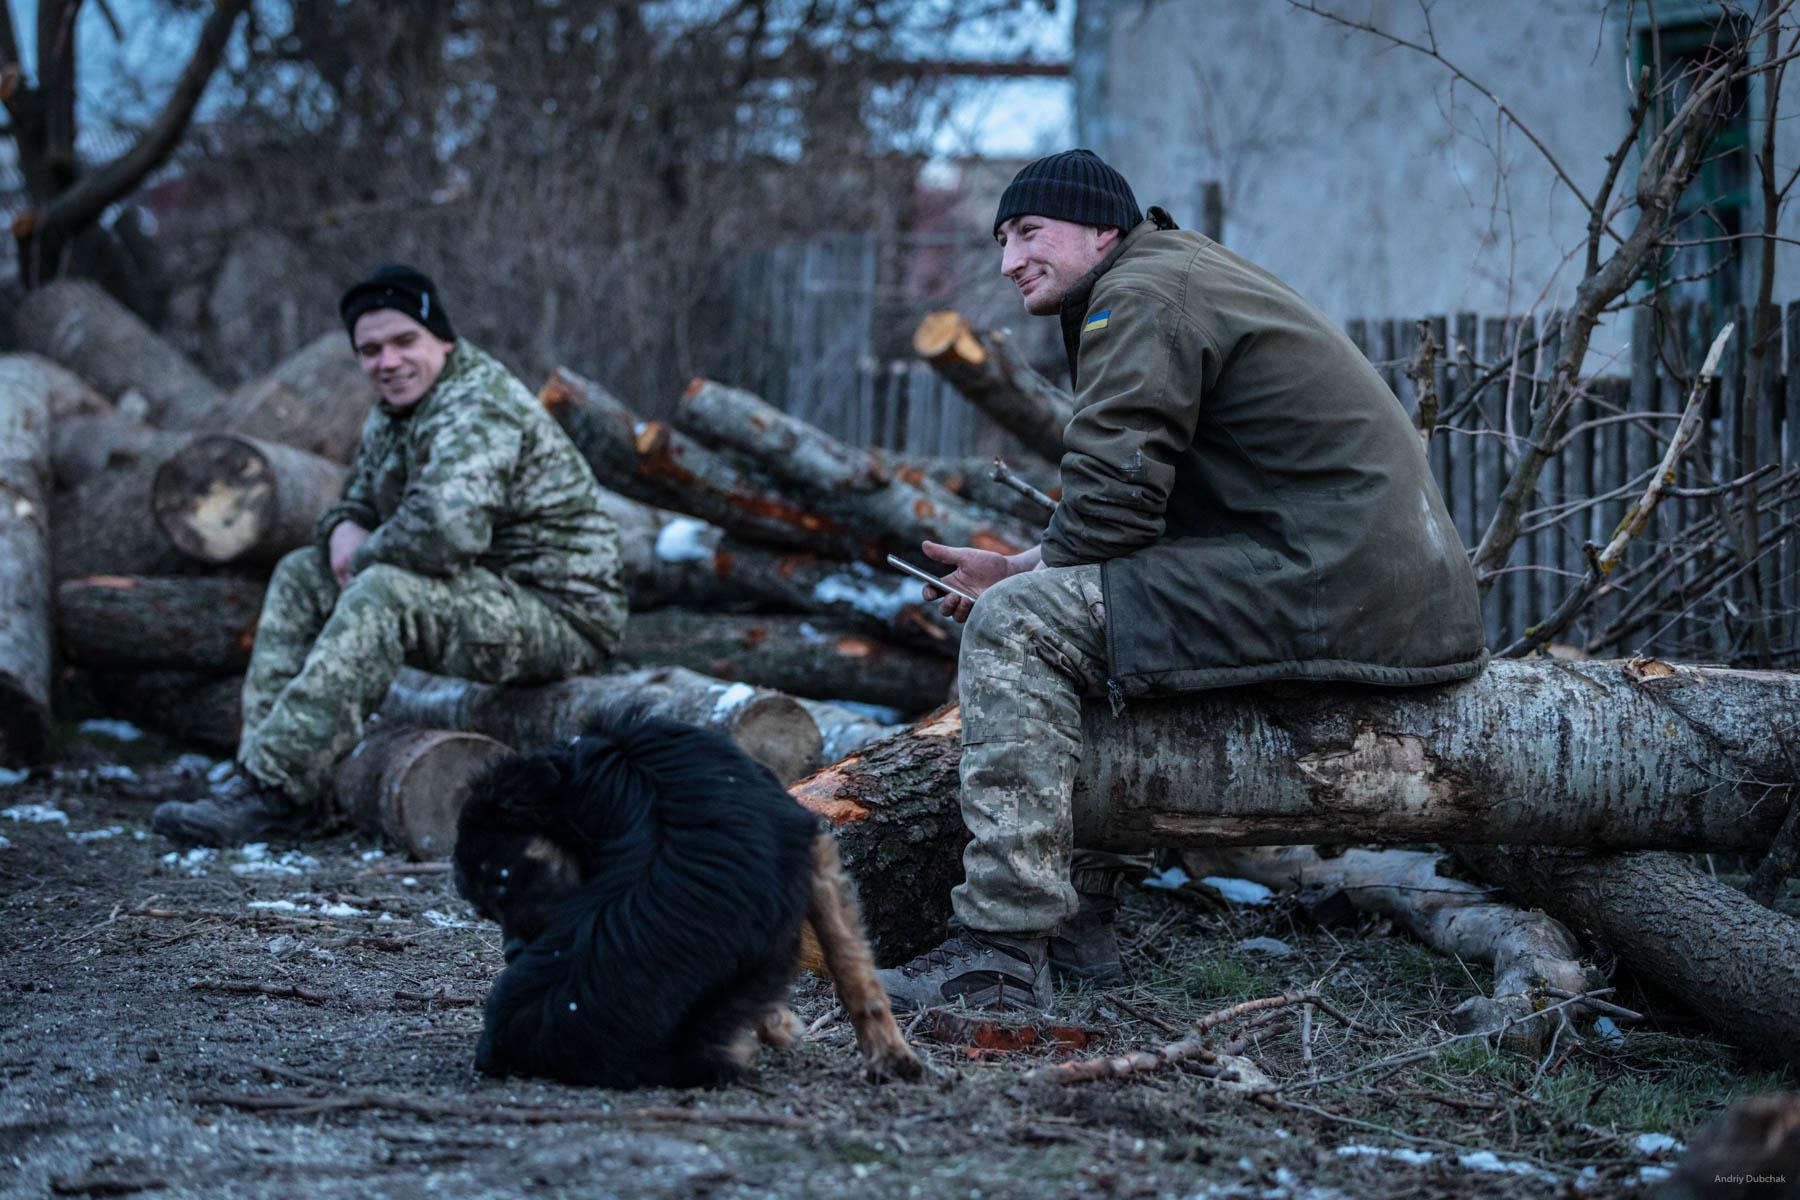 Driver, Vasily, and sailor, Dmitry, rest after harvesting firewood. Shirokine, March 2018.